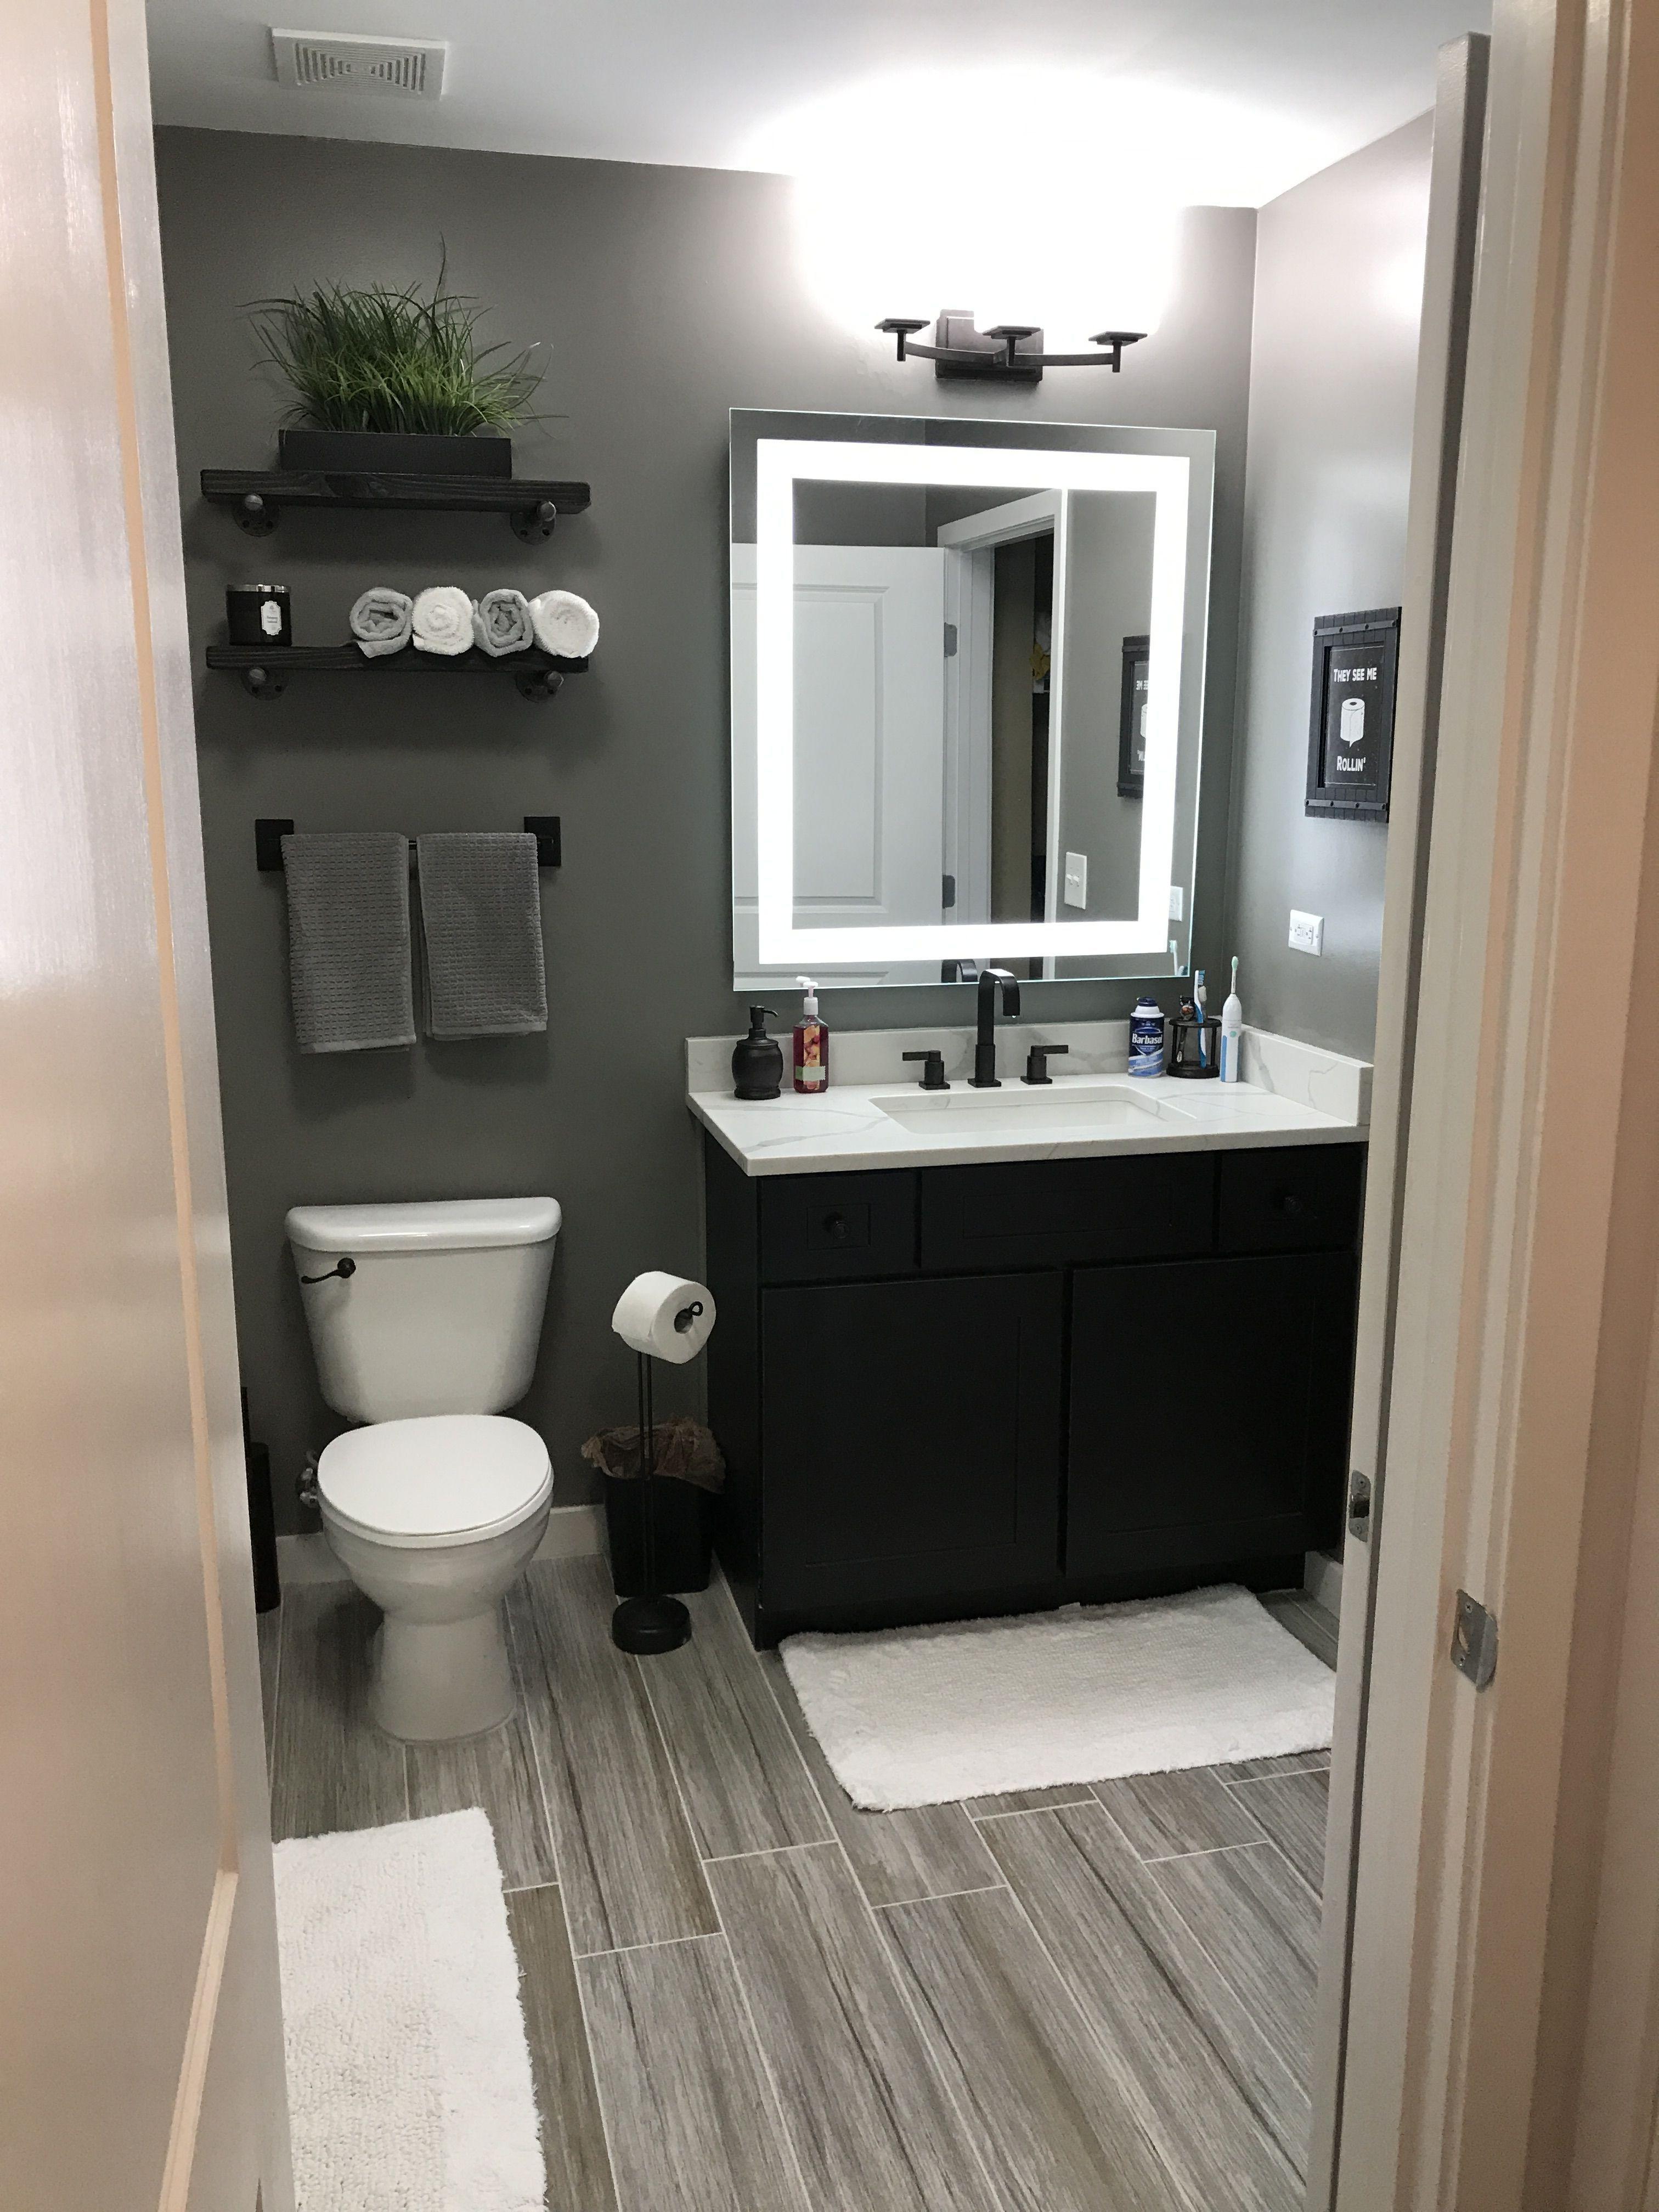 Inspiring Grey Small Bathroom Design Ideas On A Budget Greybathroom Smallbathroom Bathroomremode Small Bathroom Makeover Man Bathroom Grey Bathrooms Designs